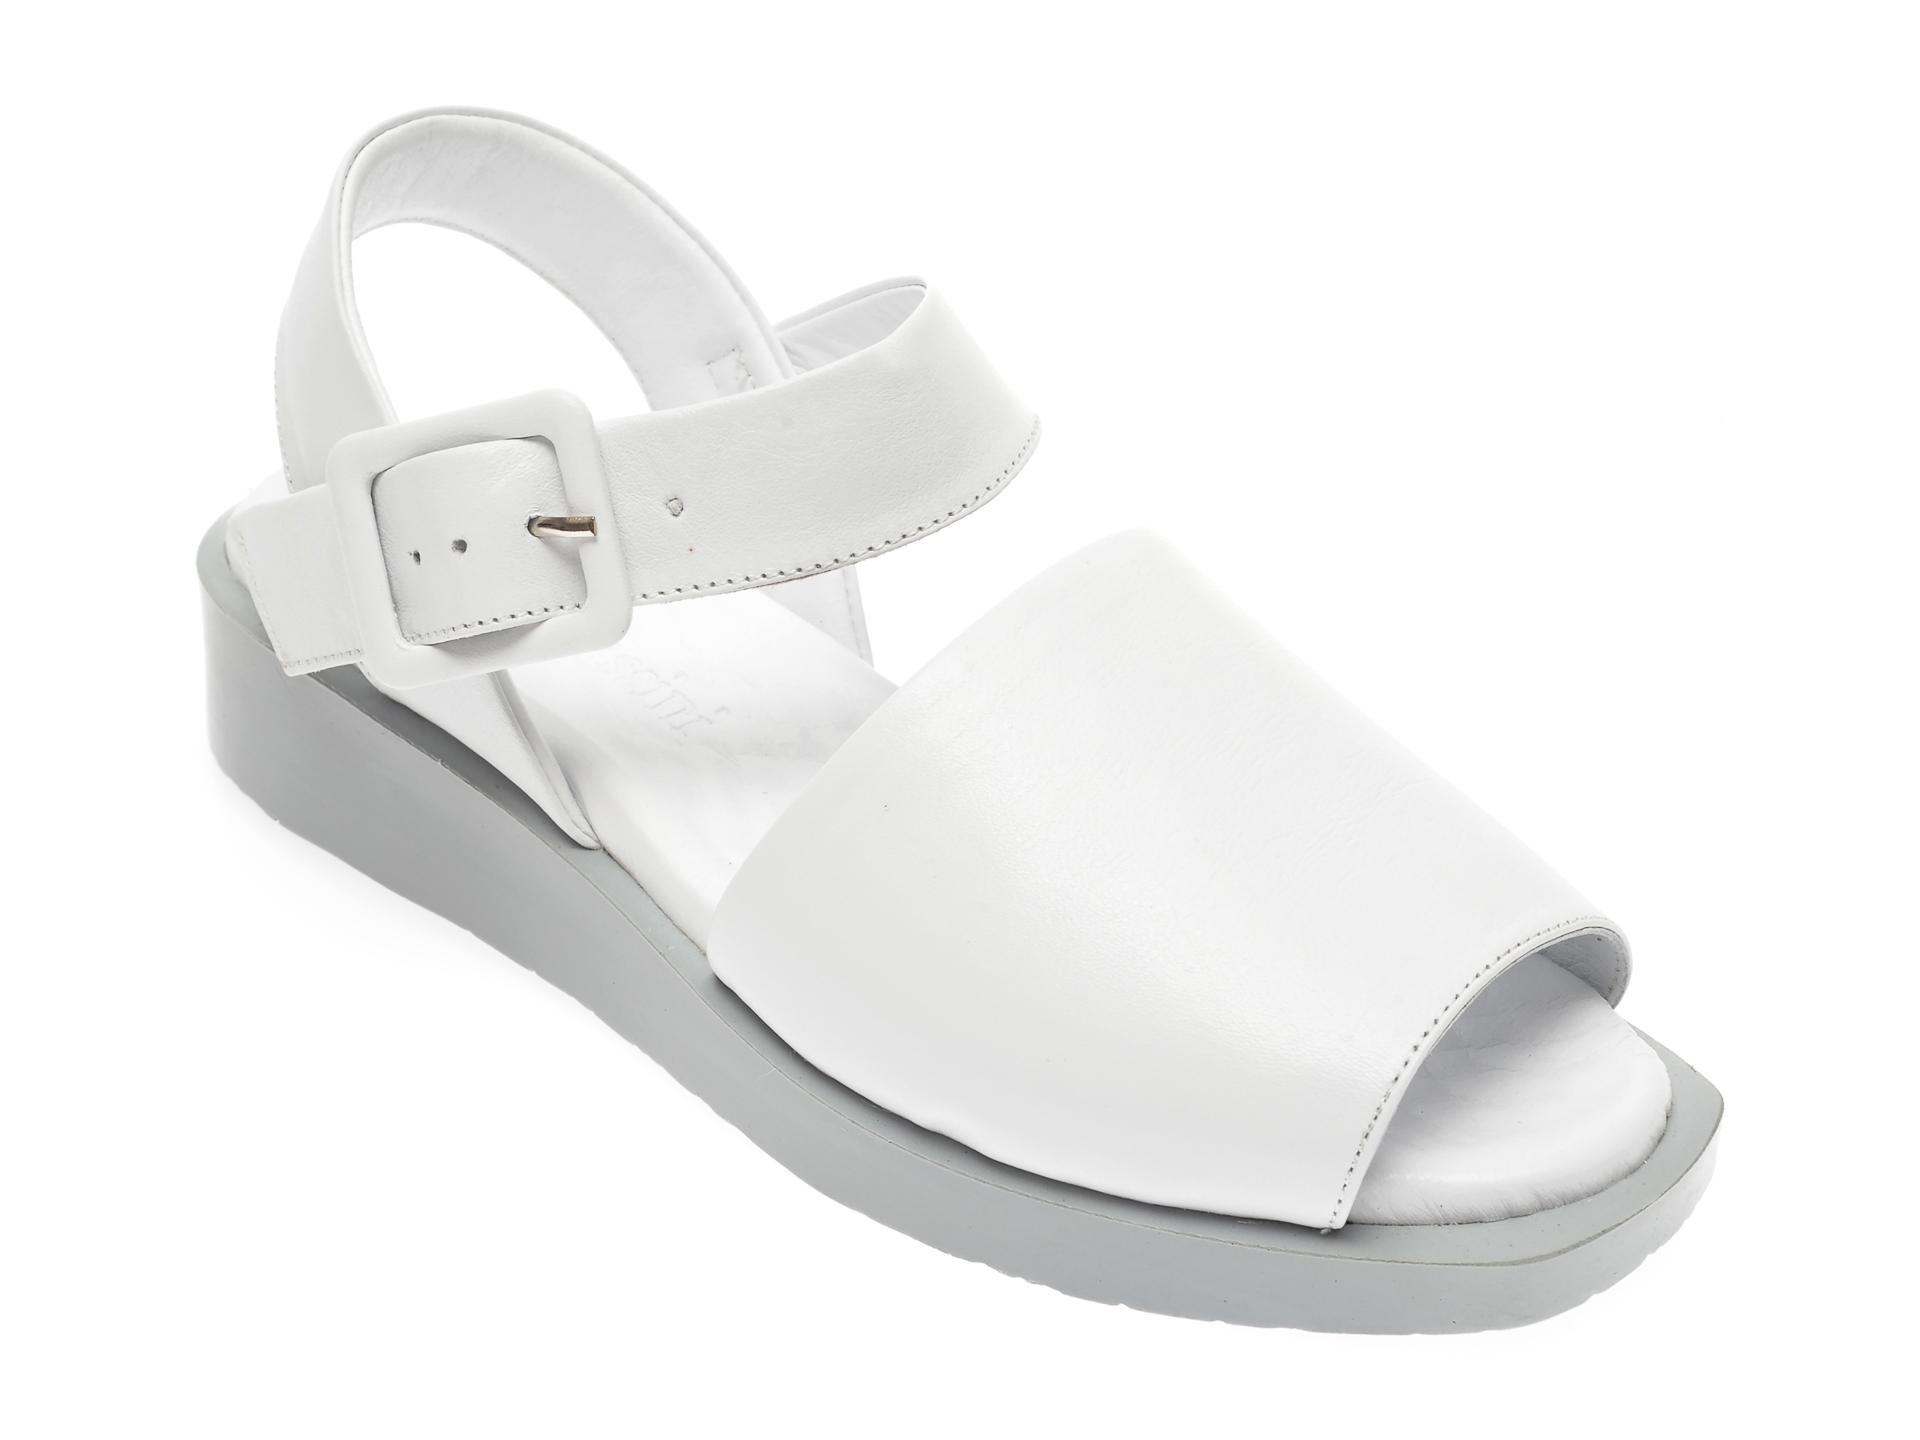 Sandale FLAVIA PASSINI albe, 1582020, din piele naturala